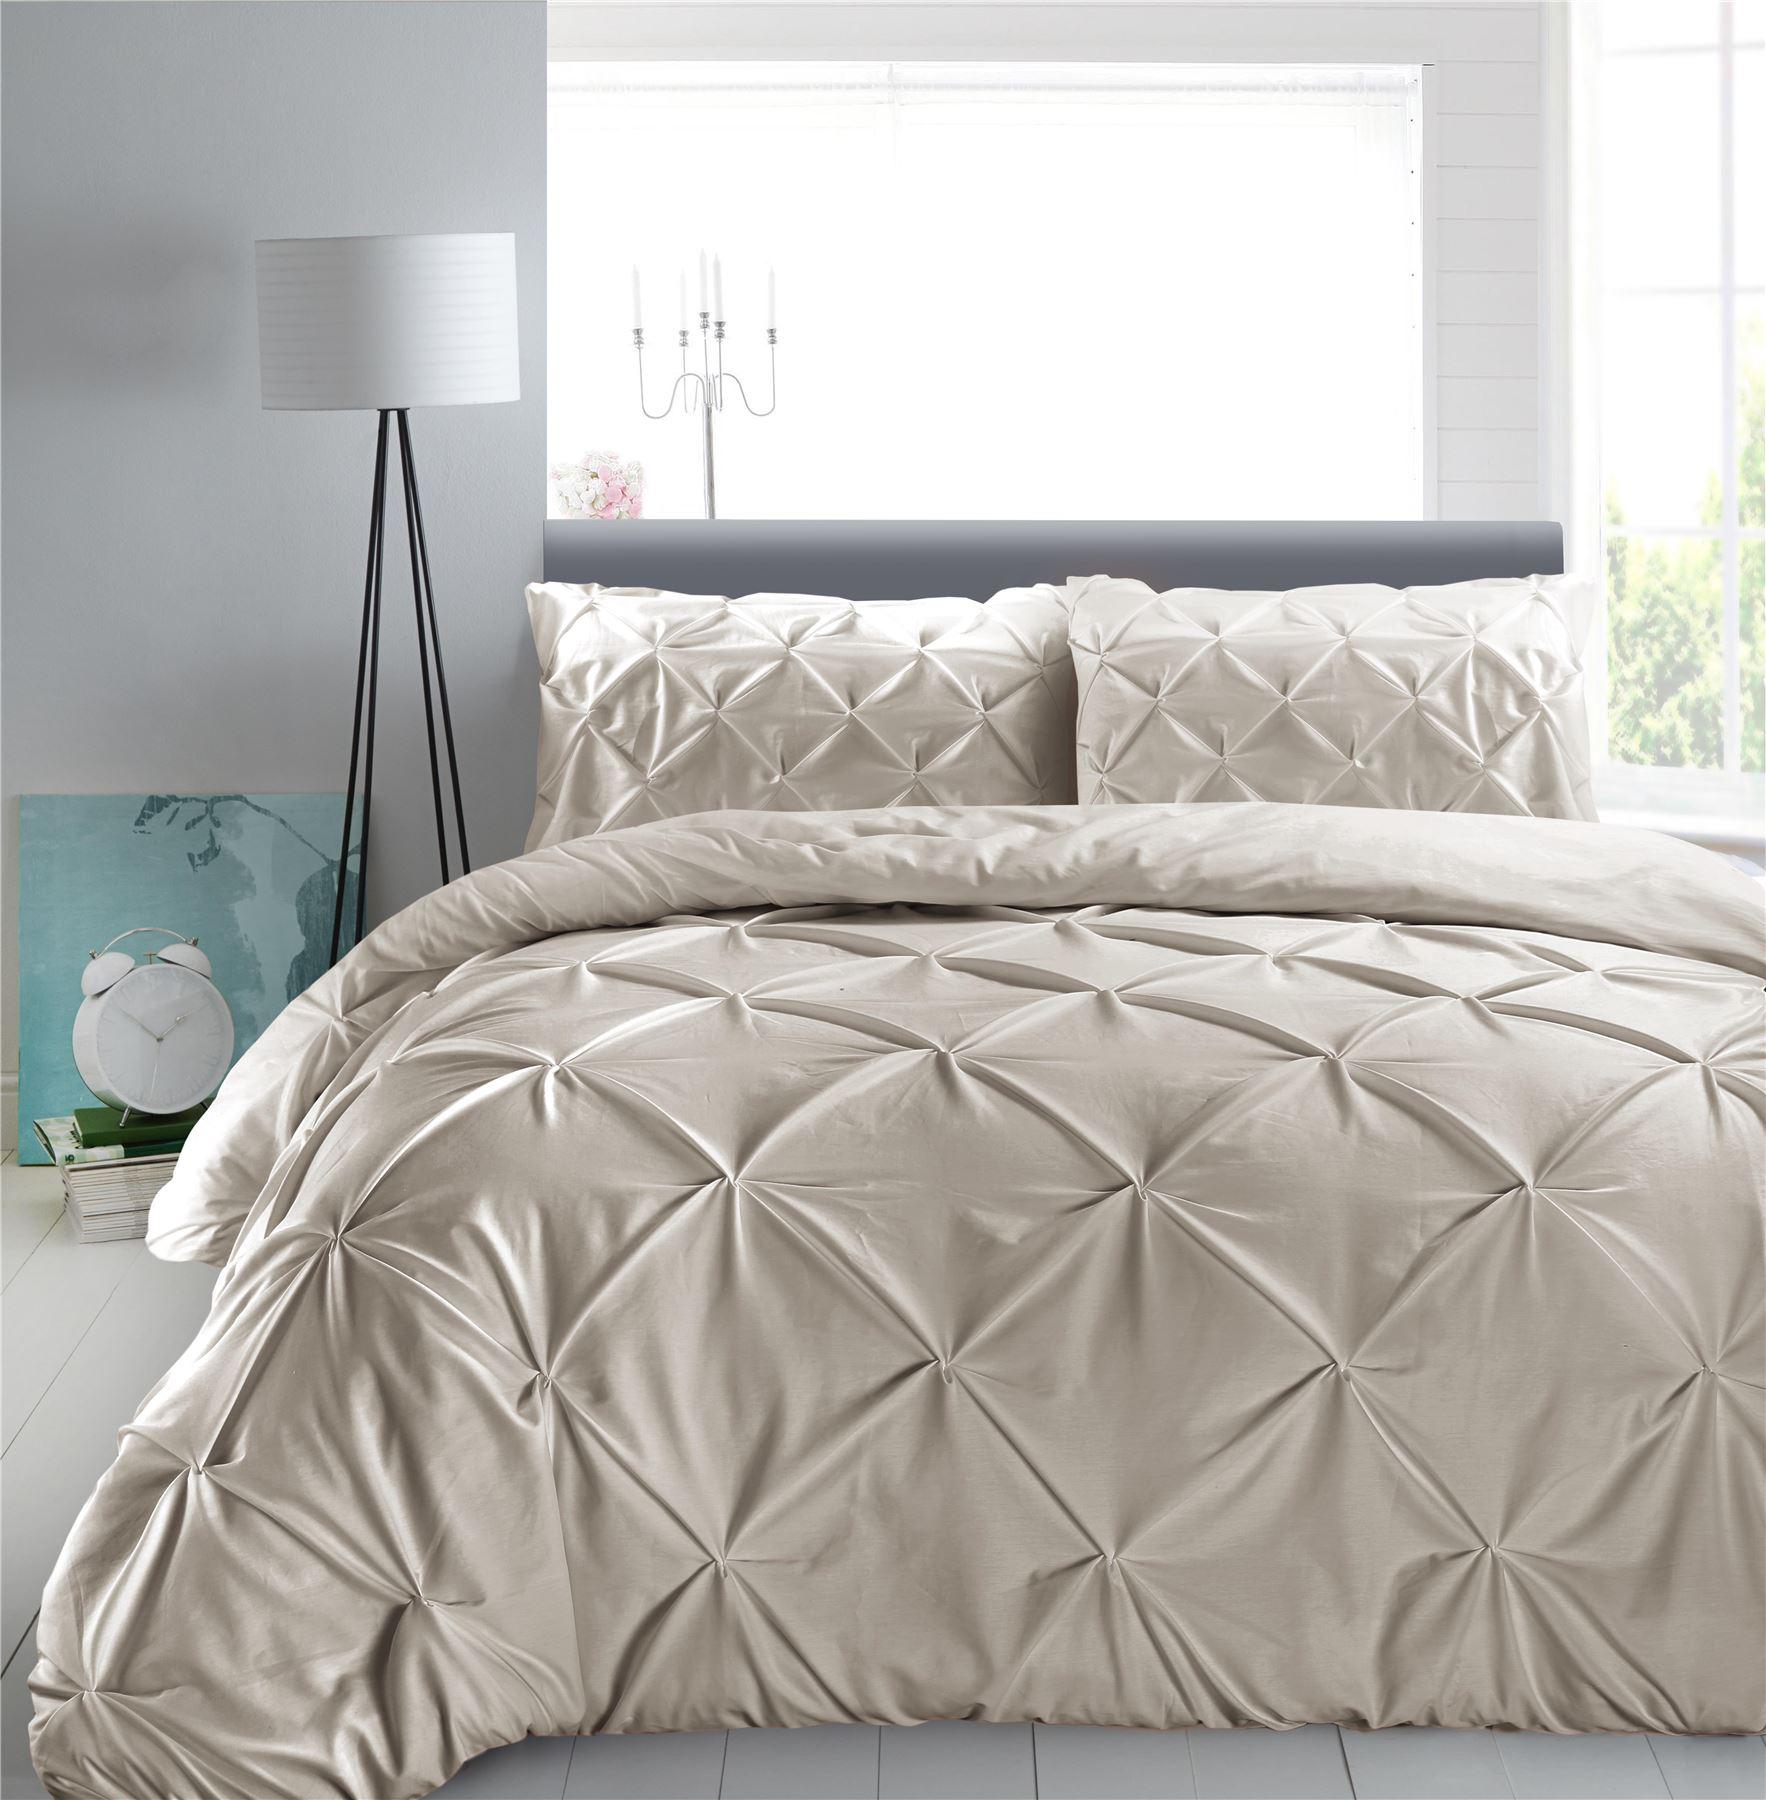 Luxury-Pure-100-Cotton-200-Thread-Pinch-Pleat-Pintuck-Puckering-Duvet-Cover-Set thumbnail 57